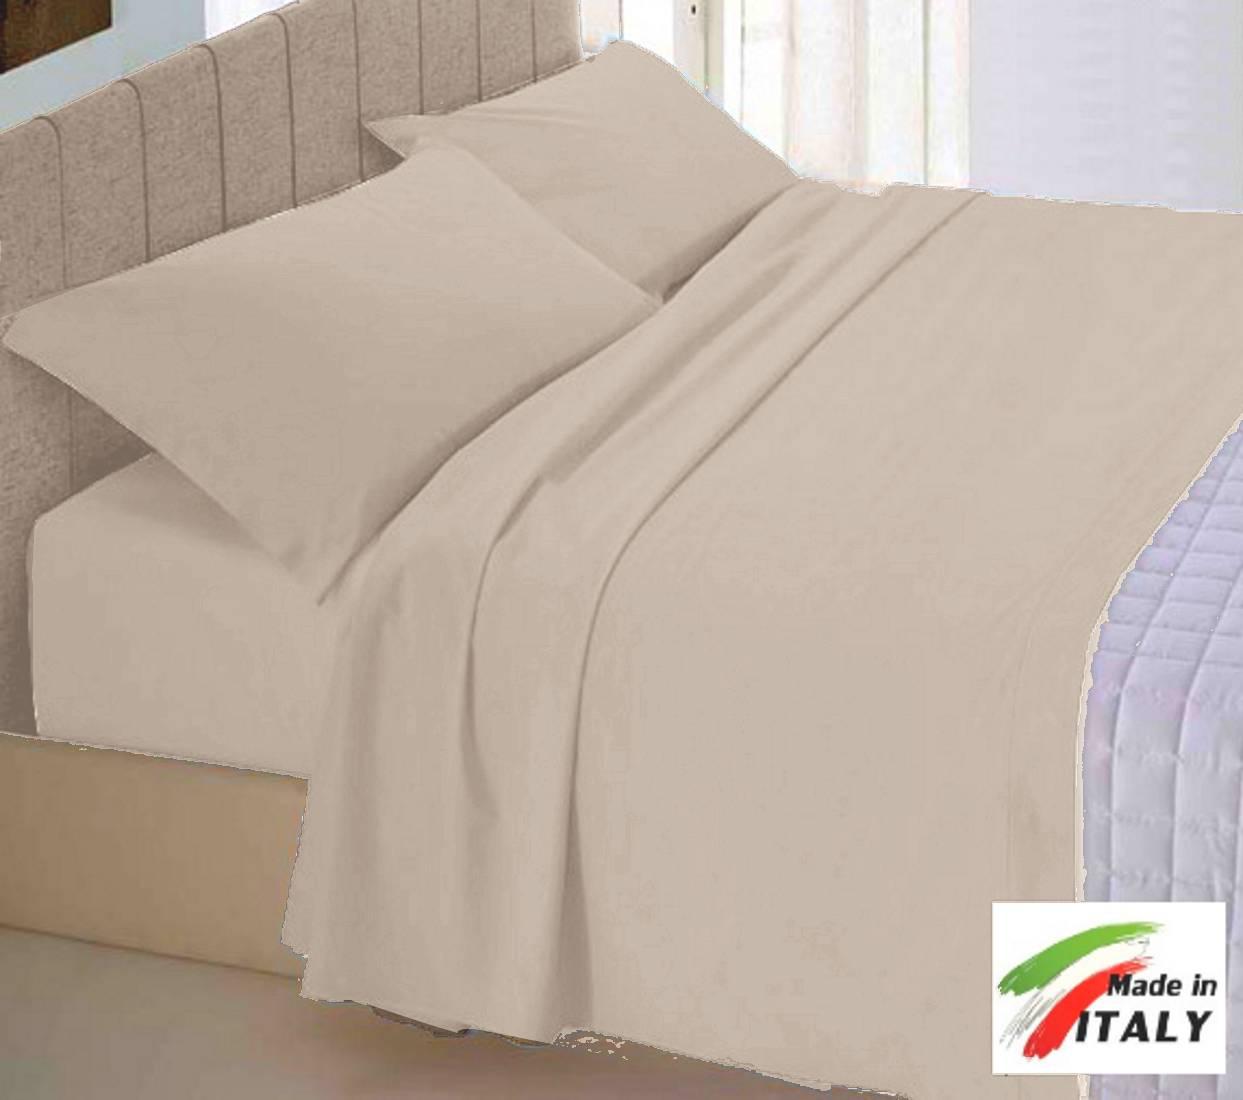 Parure Copripiumino Made in Italy 100% cotone Tinta Unita